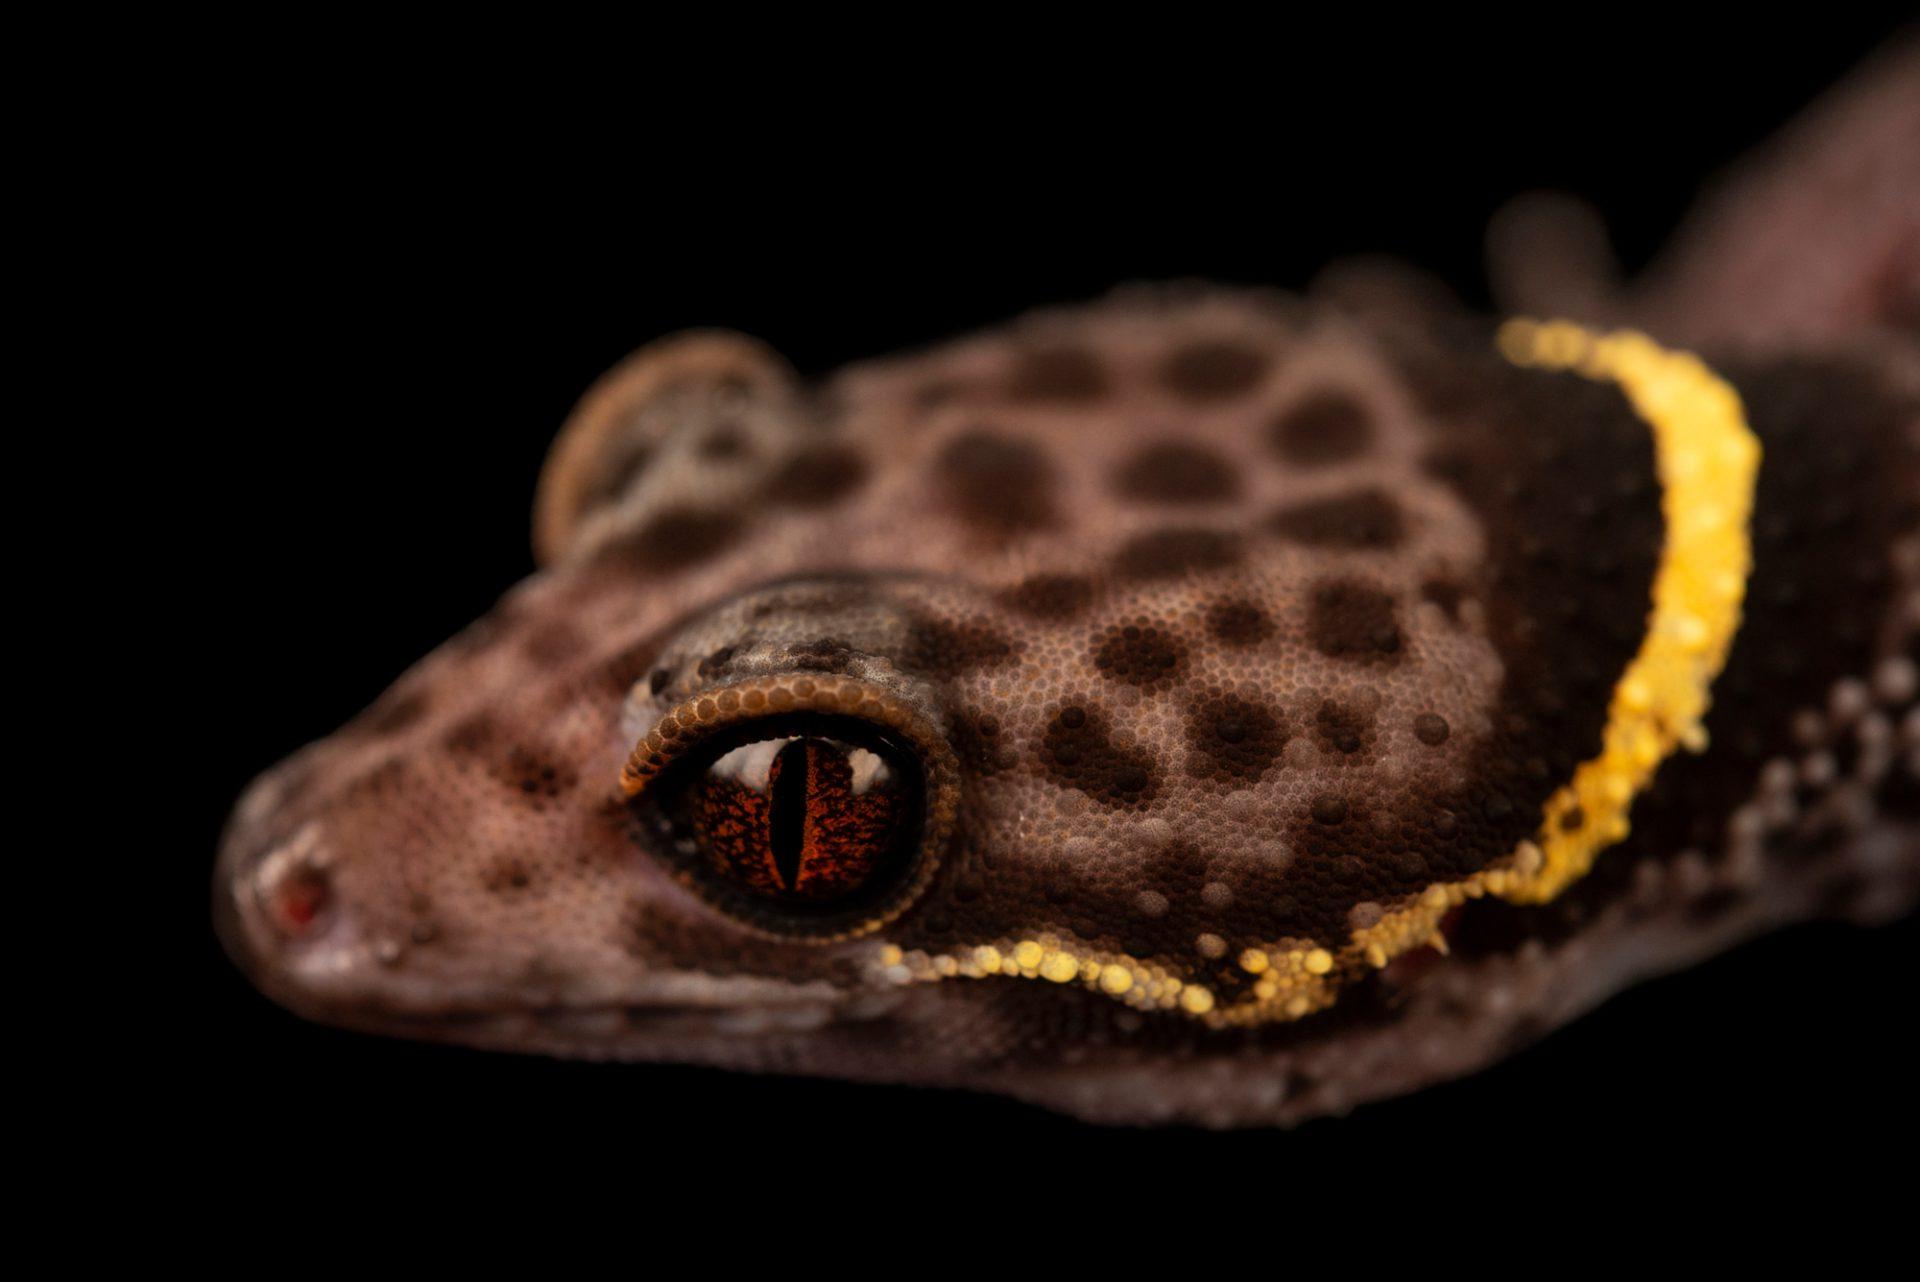 Photo: Chinese cave gecko (Goniurosaurus hainanensis) at Loro Parque.